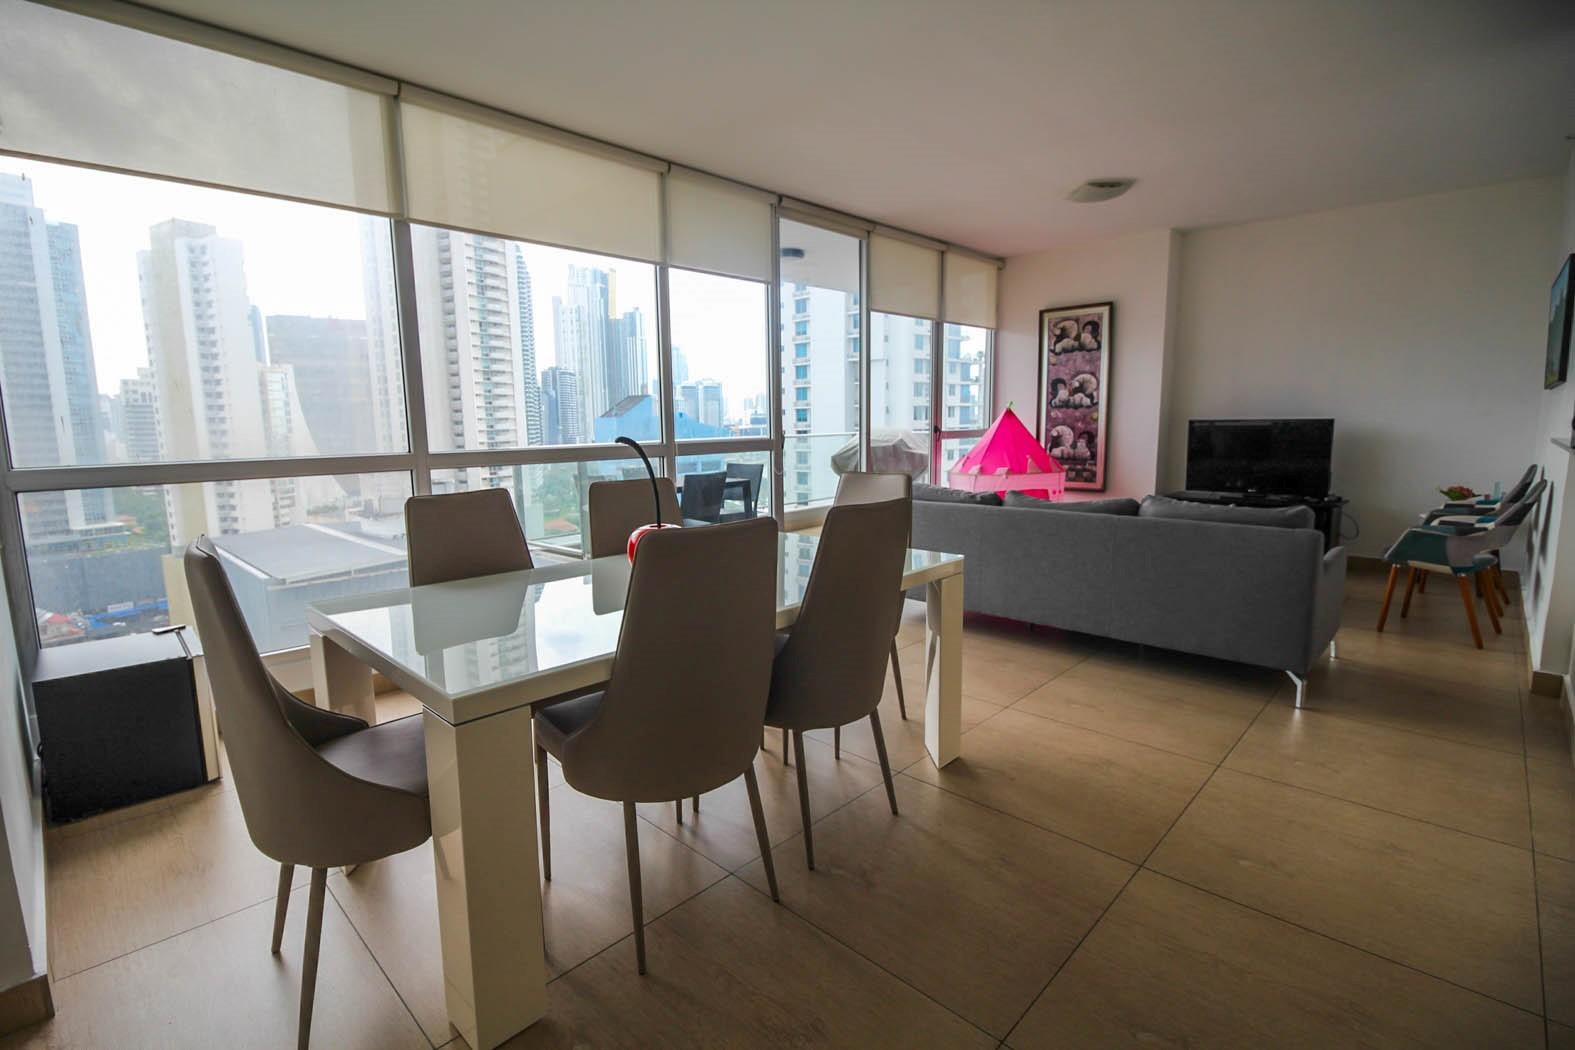 Avenida-Balboa-Panama-property-panamaequityocean-city-views-2nd-line-balboa-ave-2.jpg